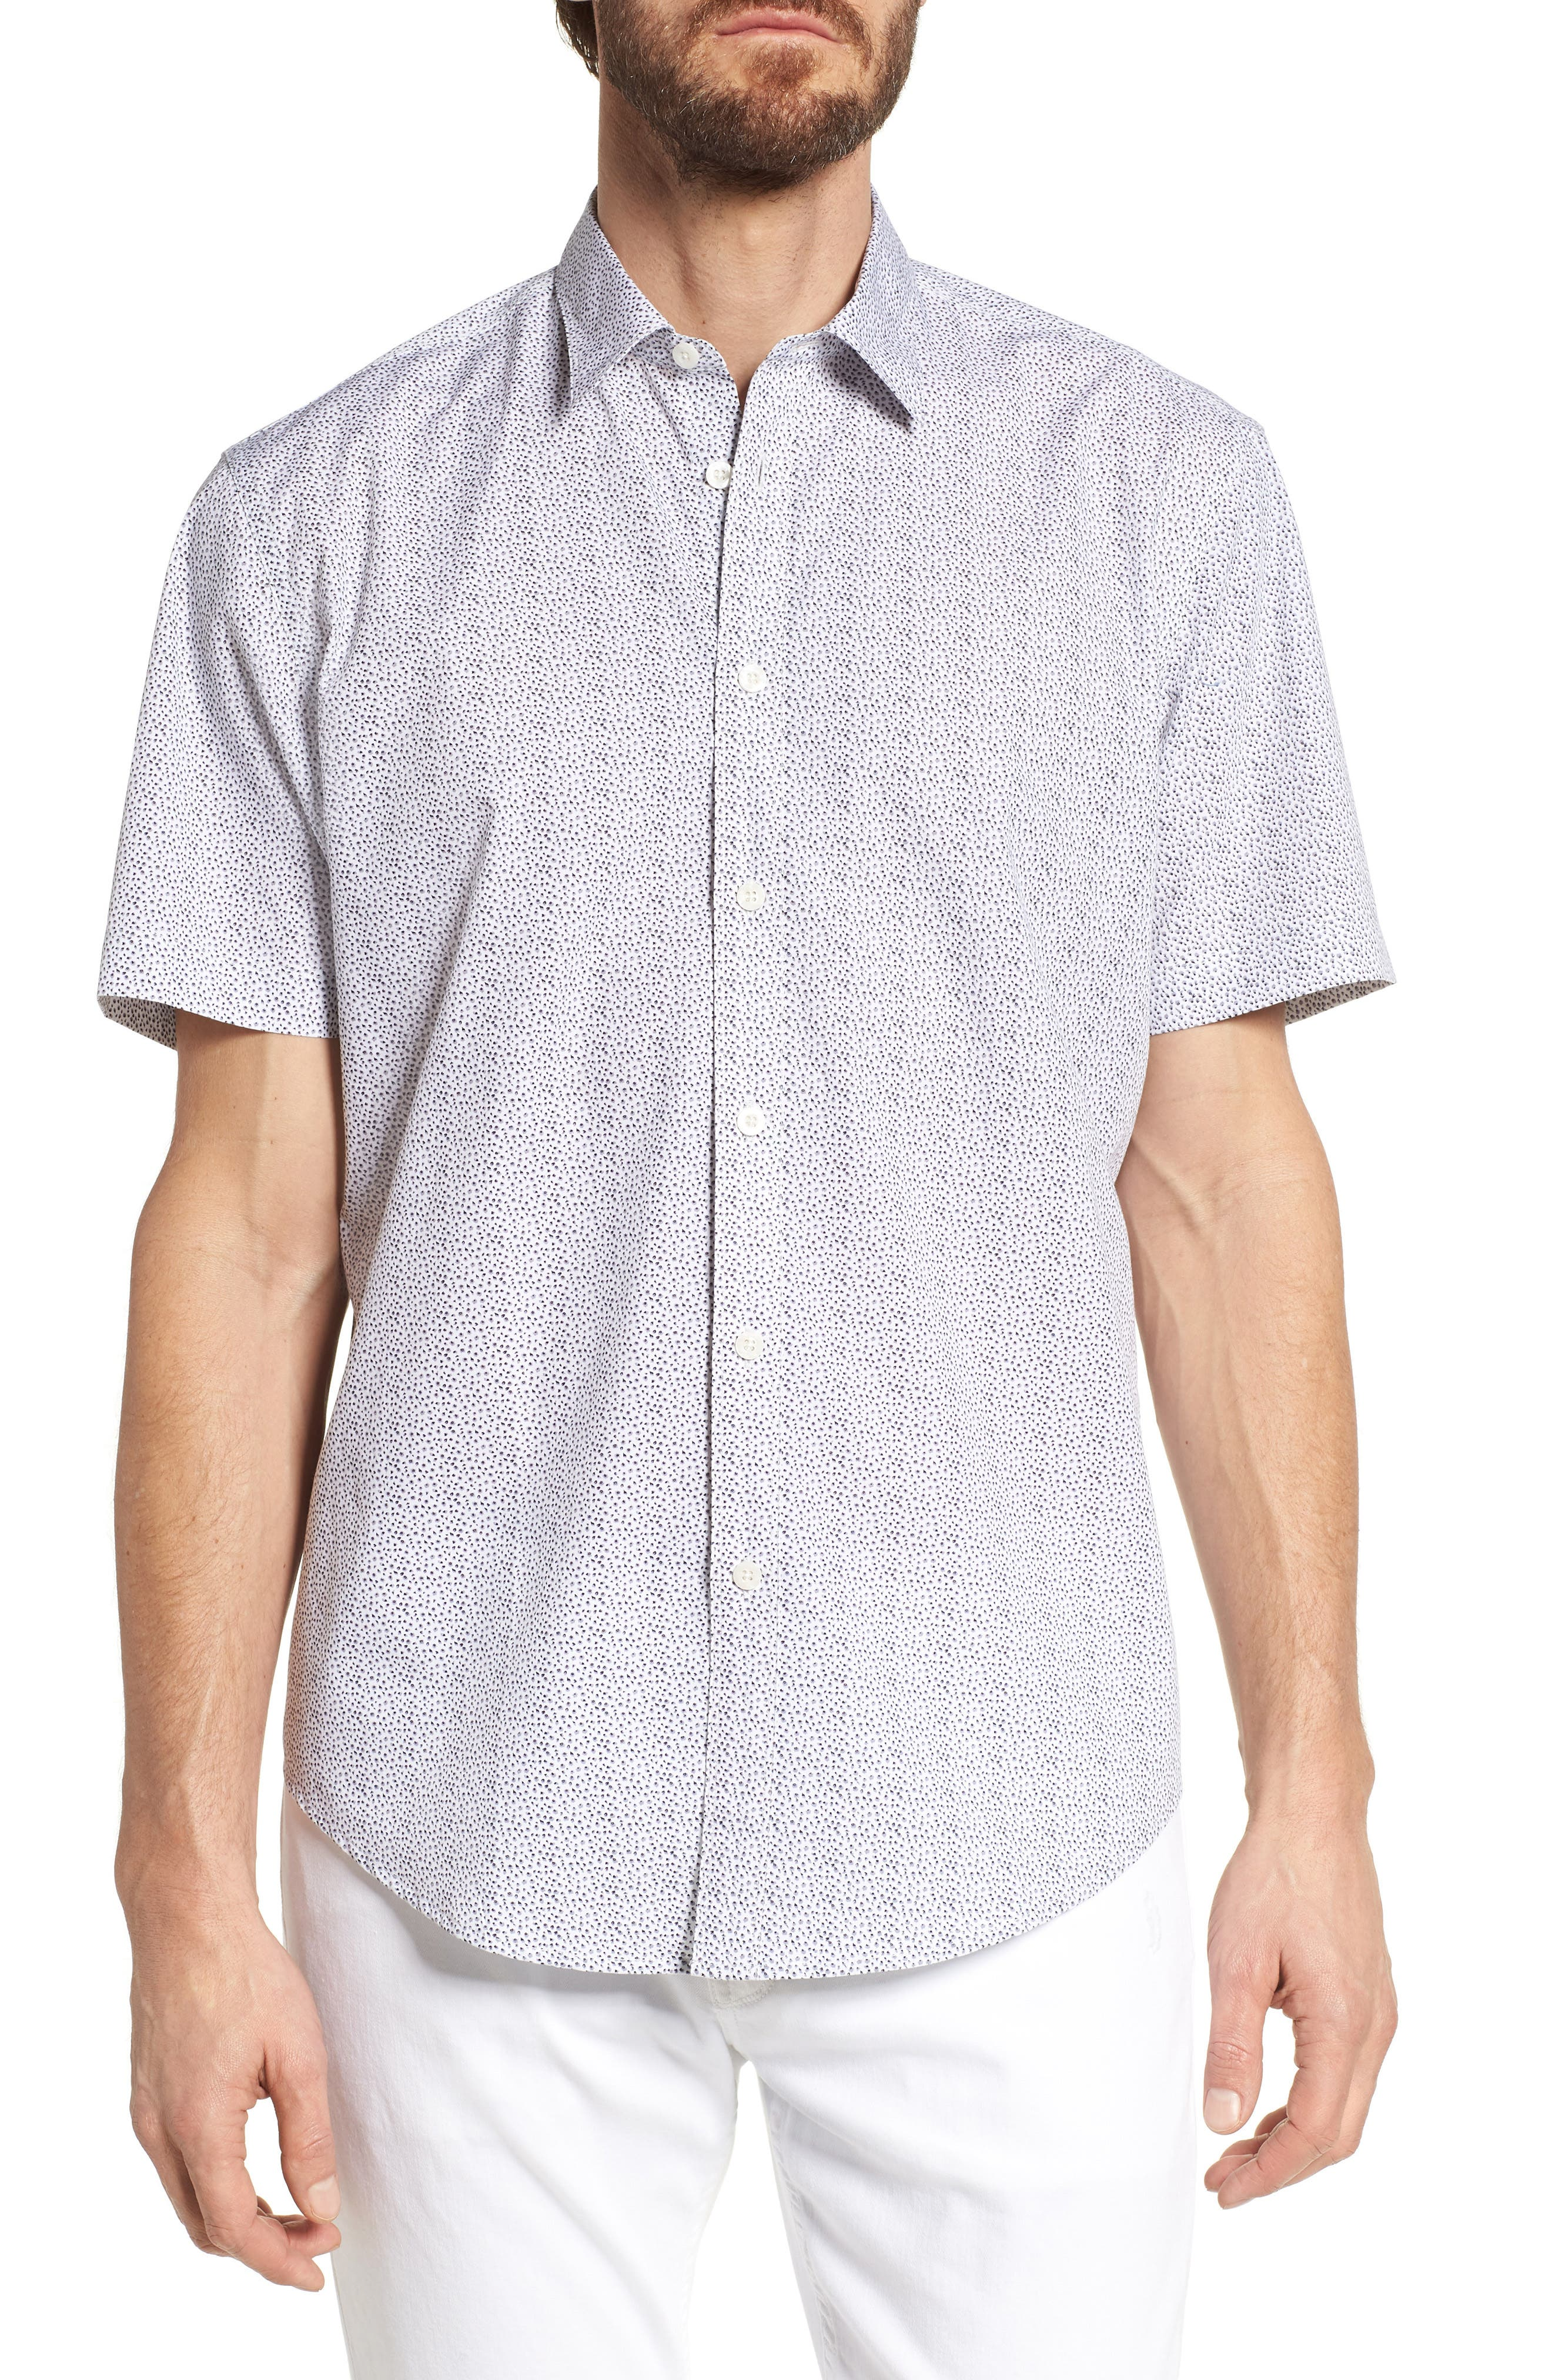 Coastaoro Cheate Regular Fit Print Short Sleeve Sport Shirt